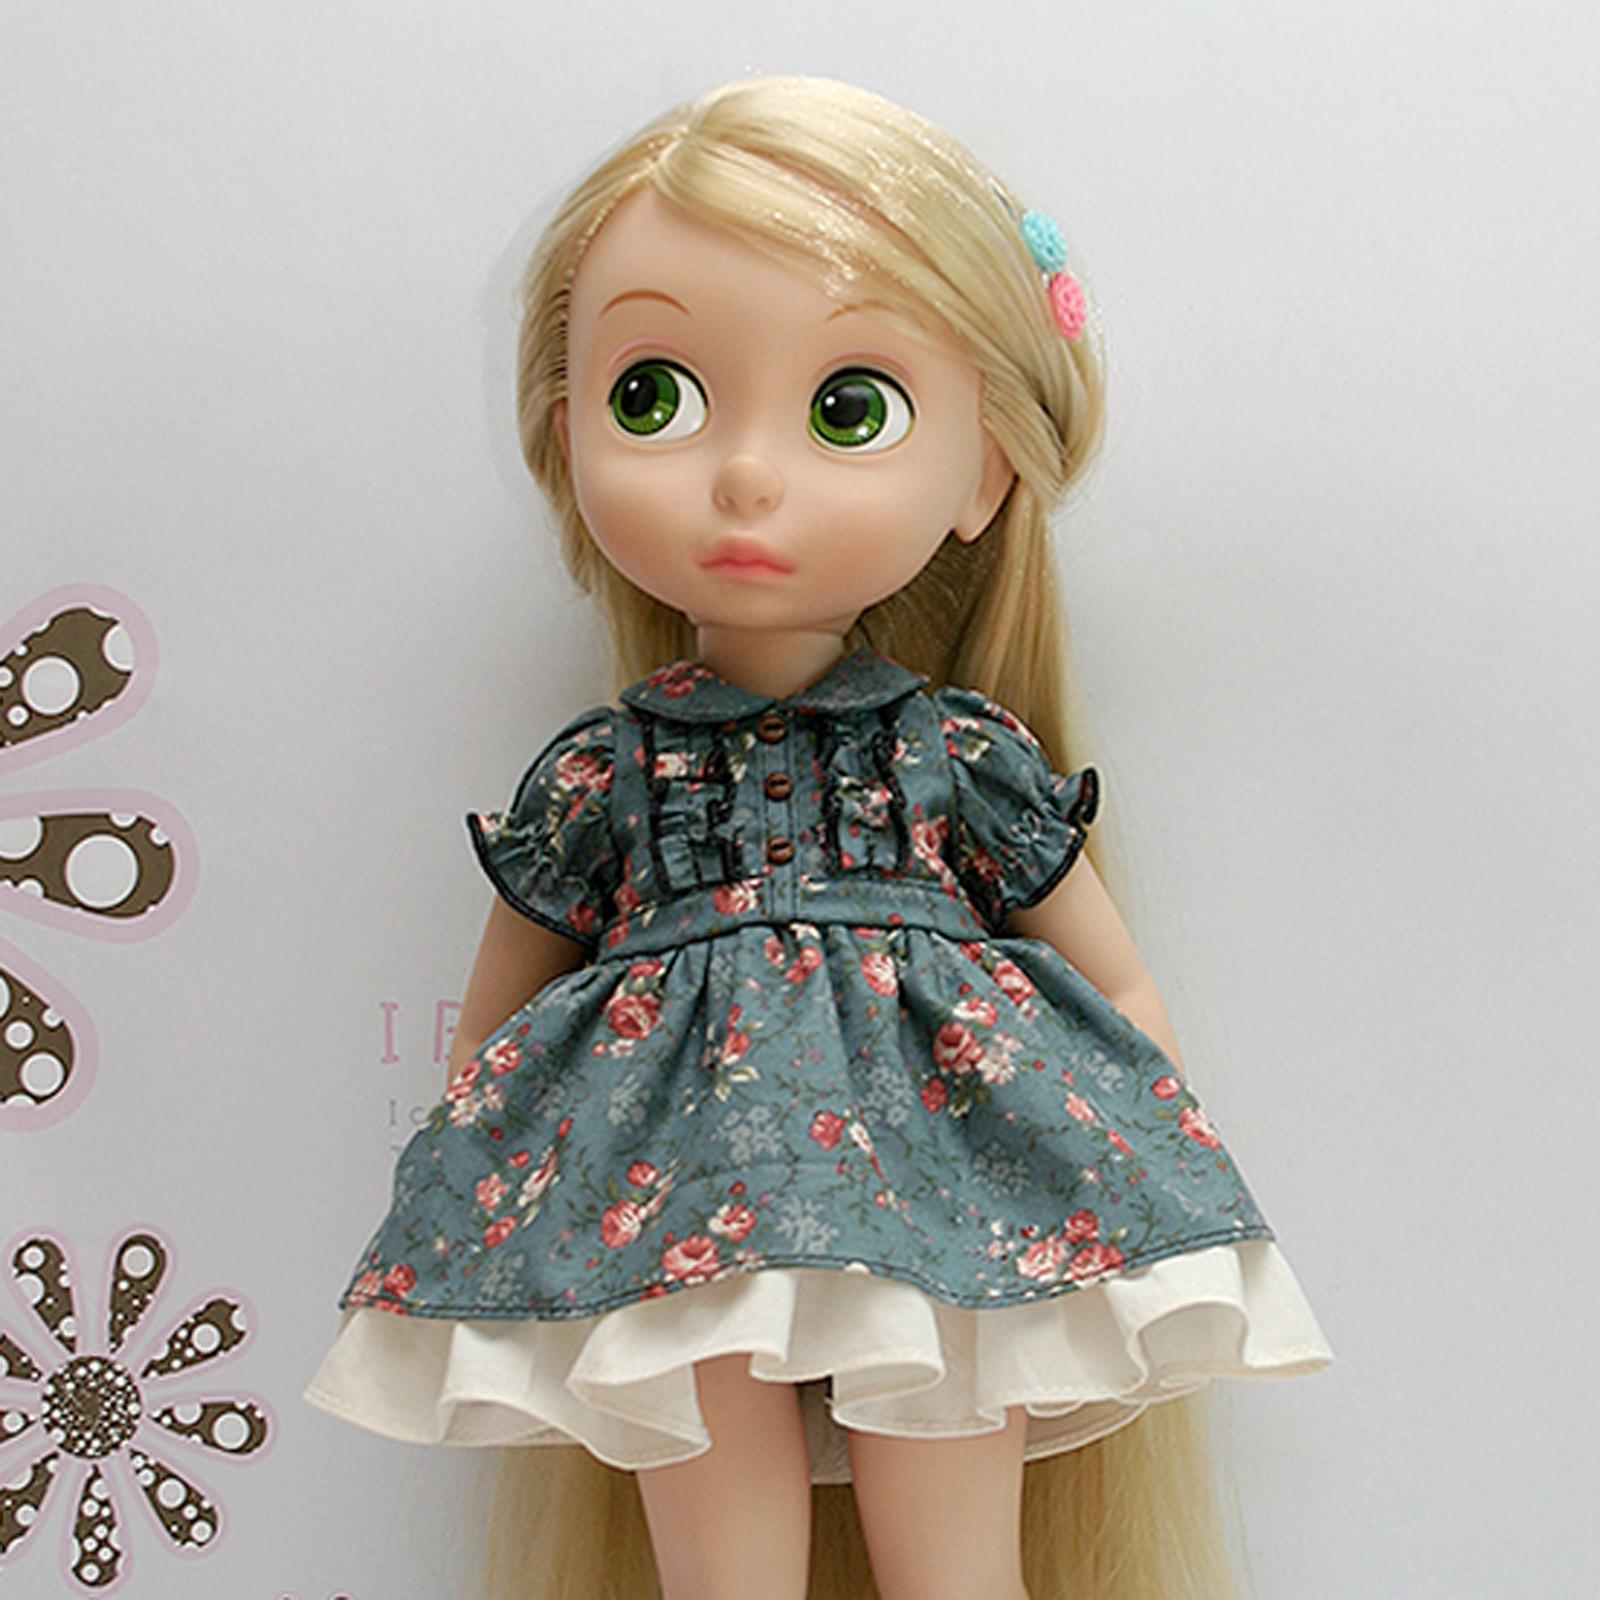 Disney Baby doll clothes dress clothing retro flower